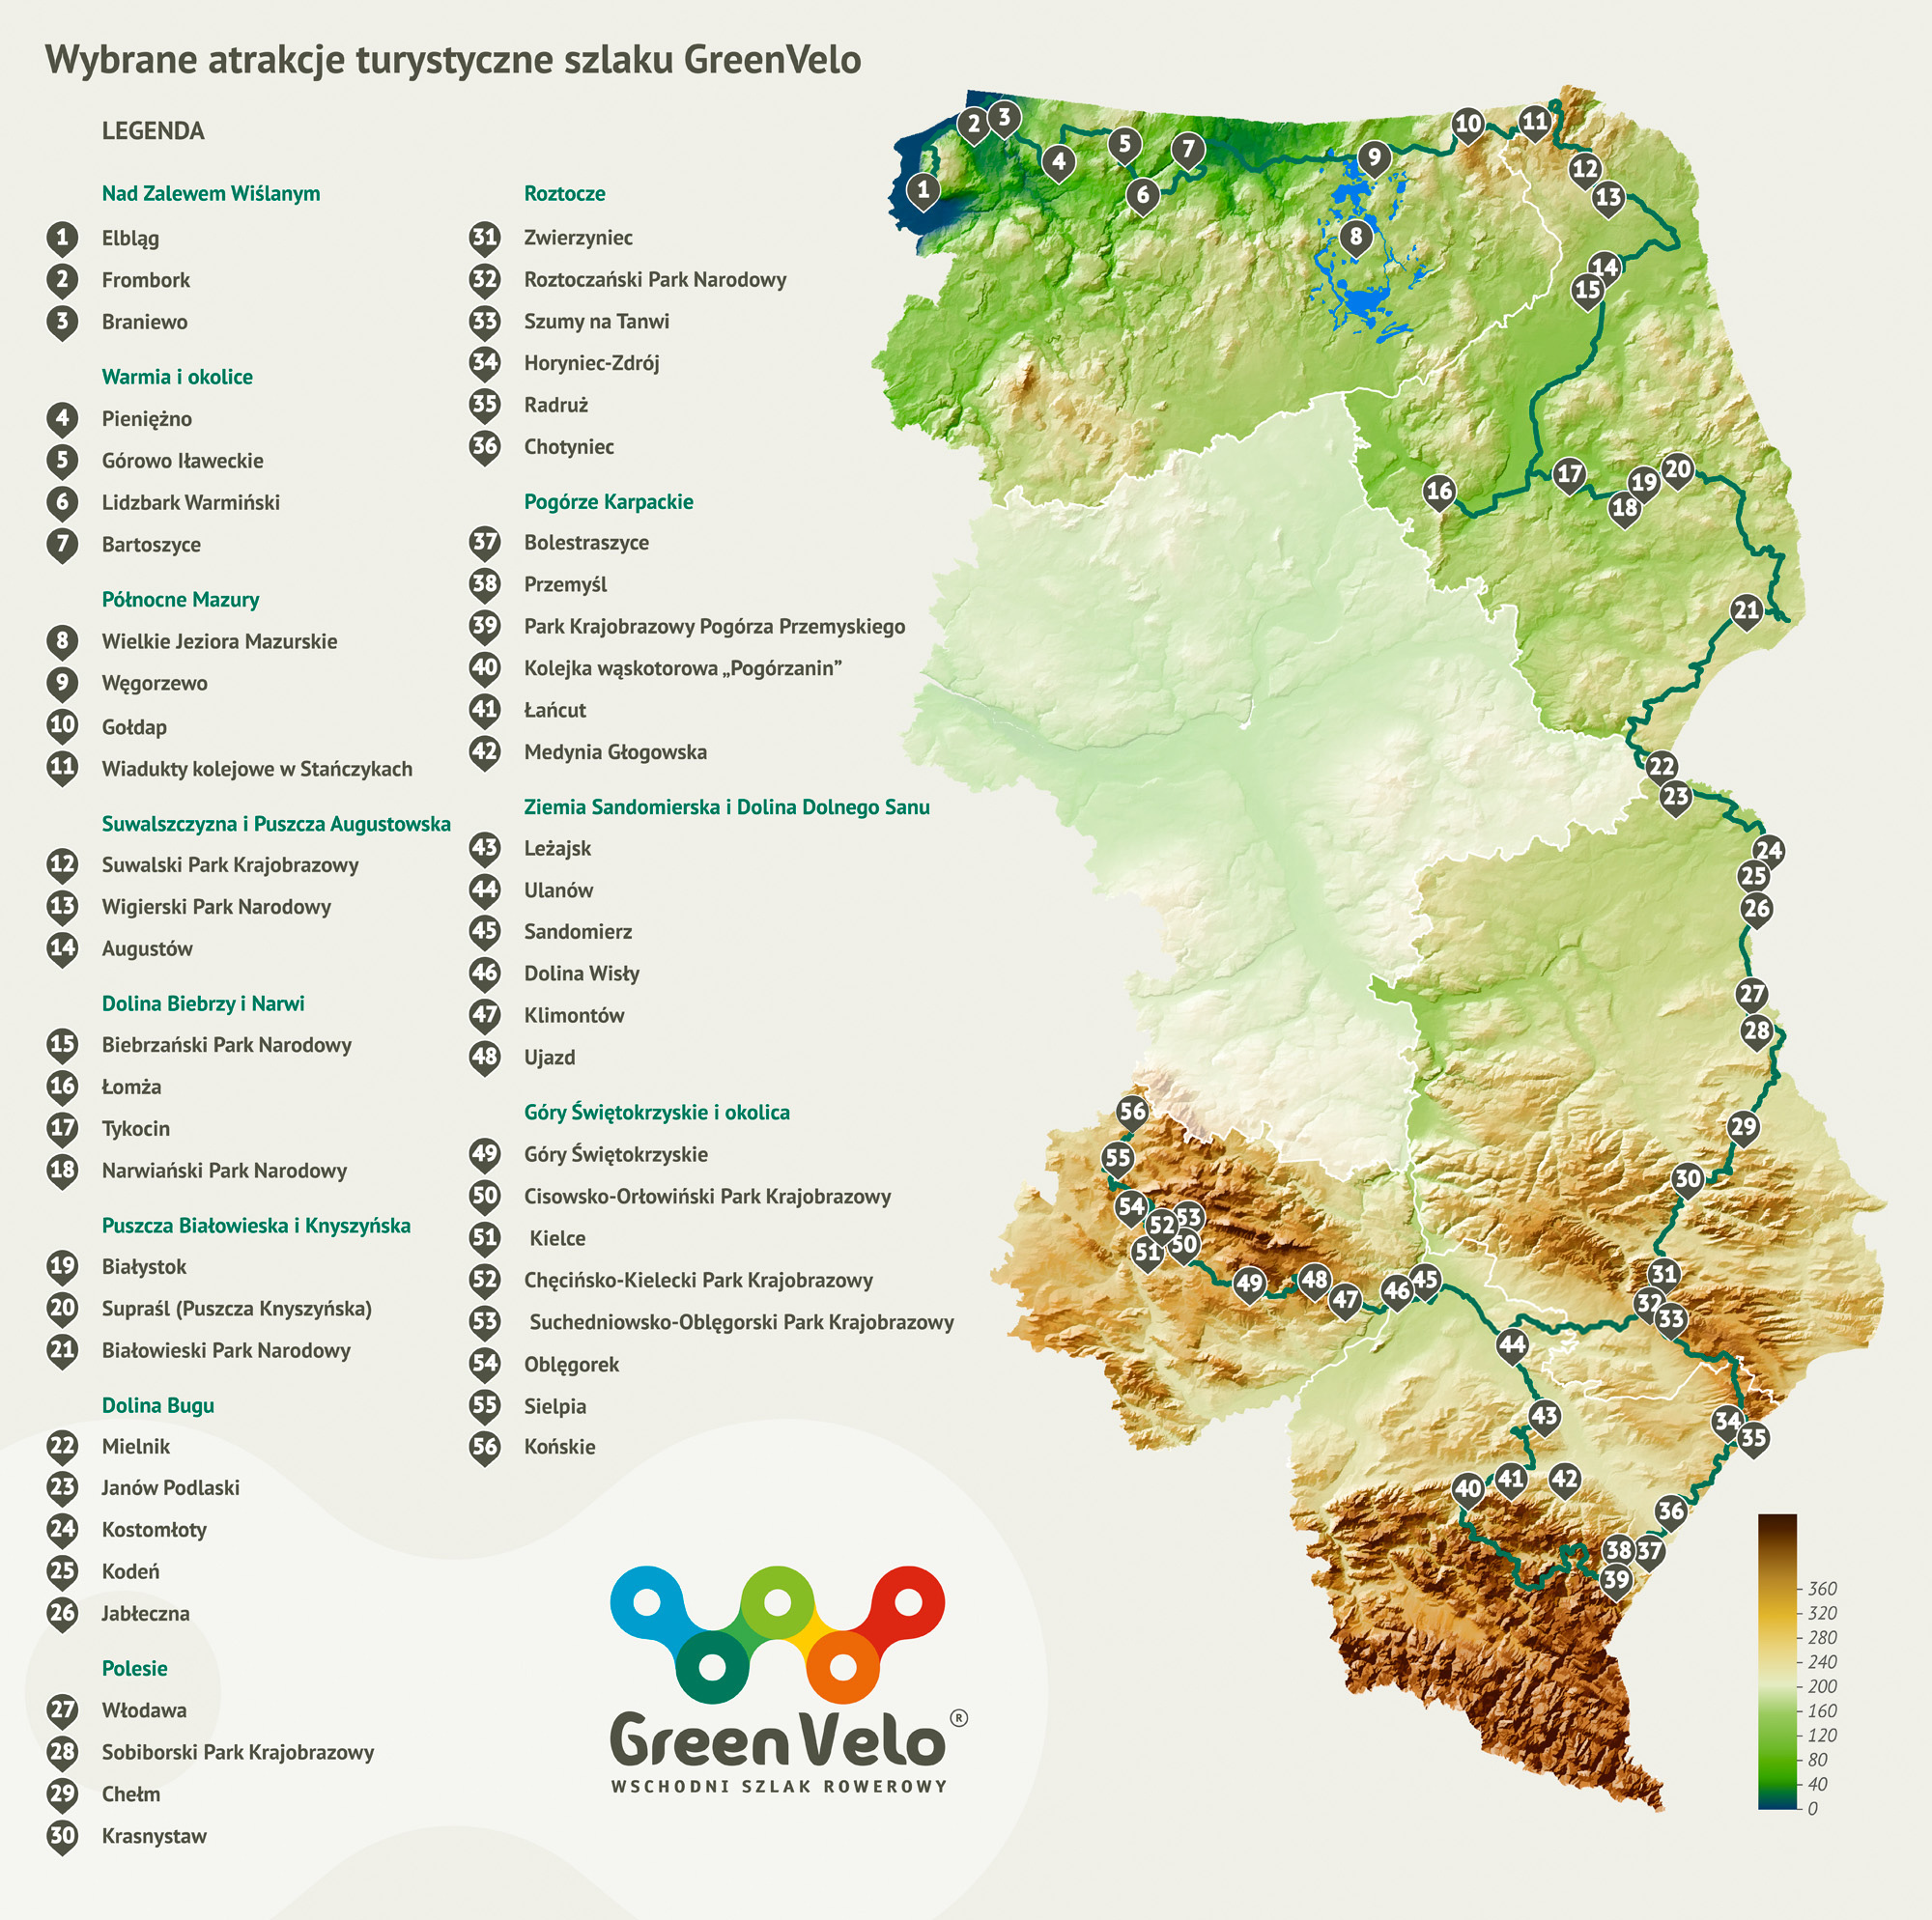 http://lubelskierowerem.pl/wp-content/uploads/2016/01/green-velo-mapa.jpg